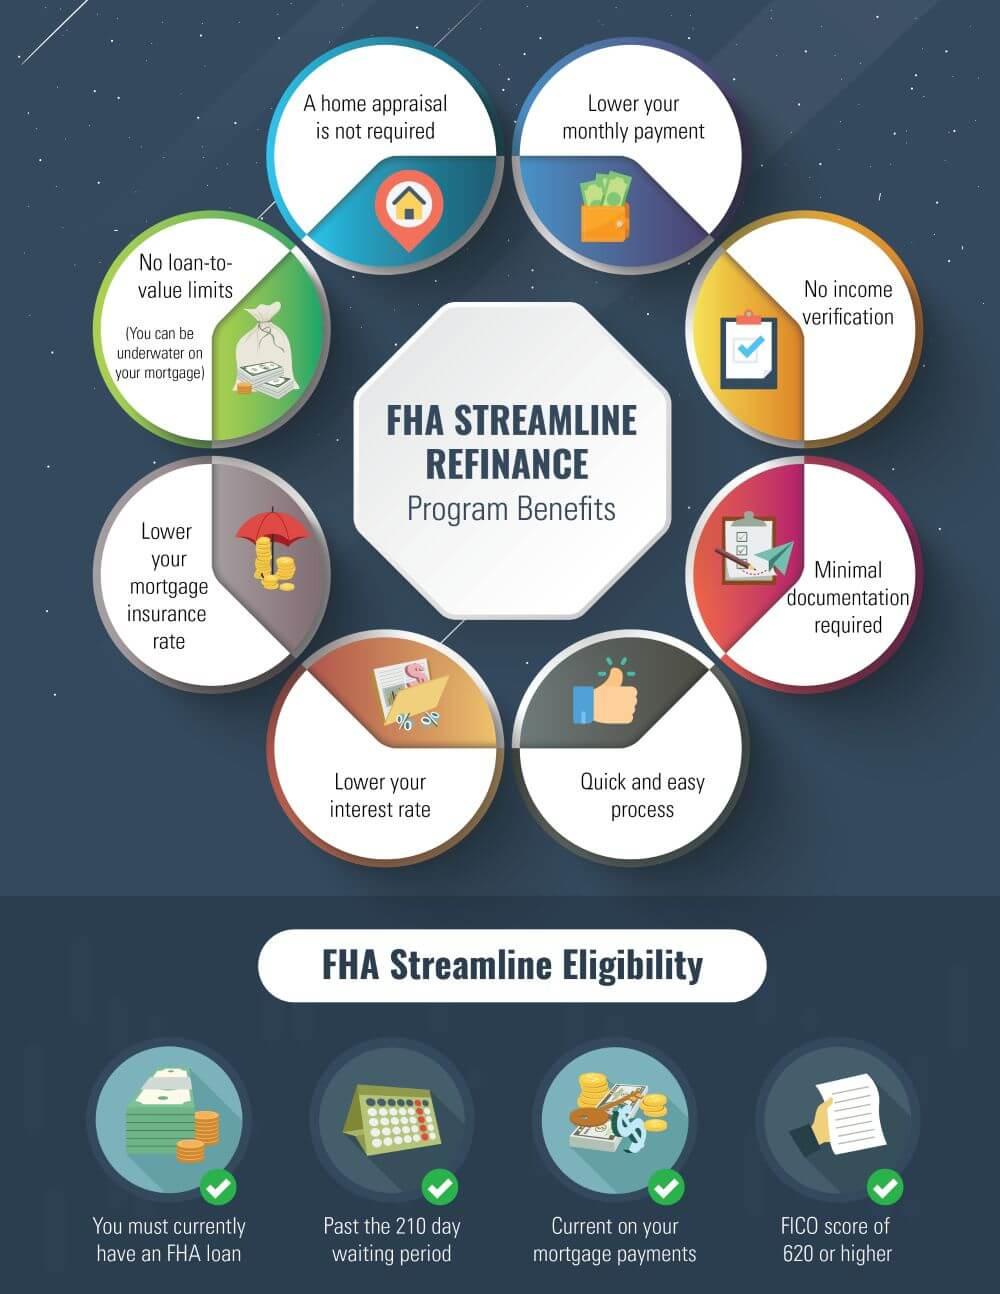 FHA Streamline Refinance Pros and Cons